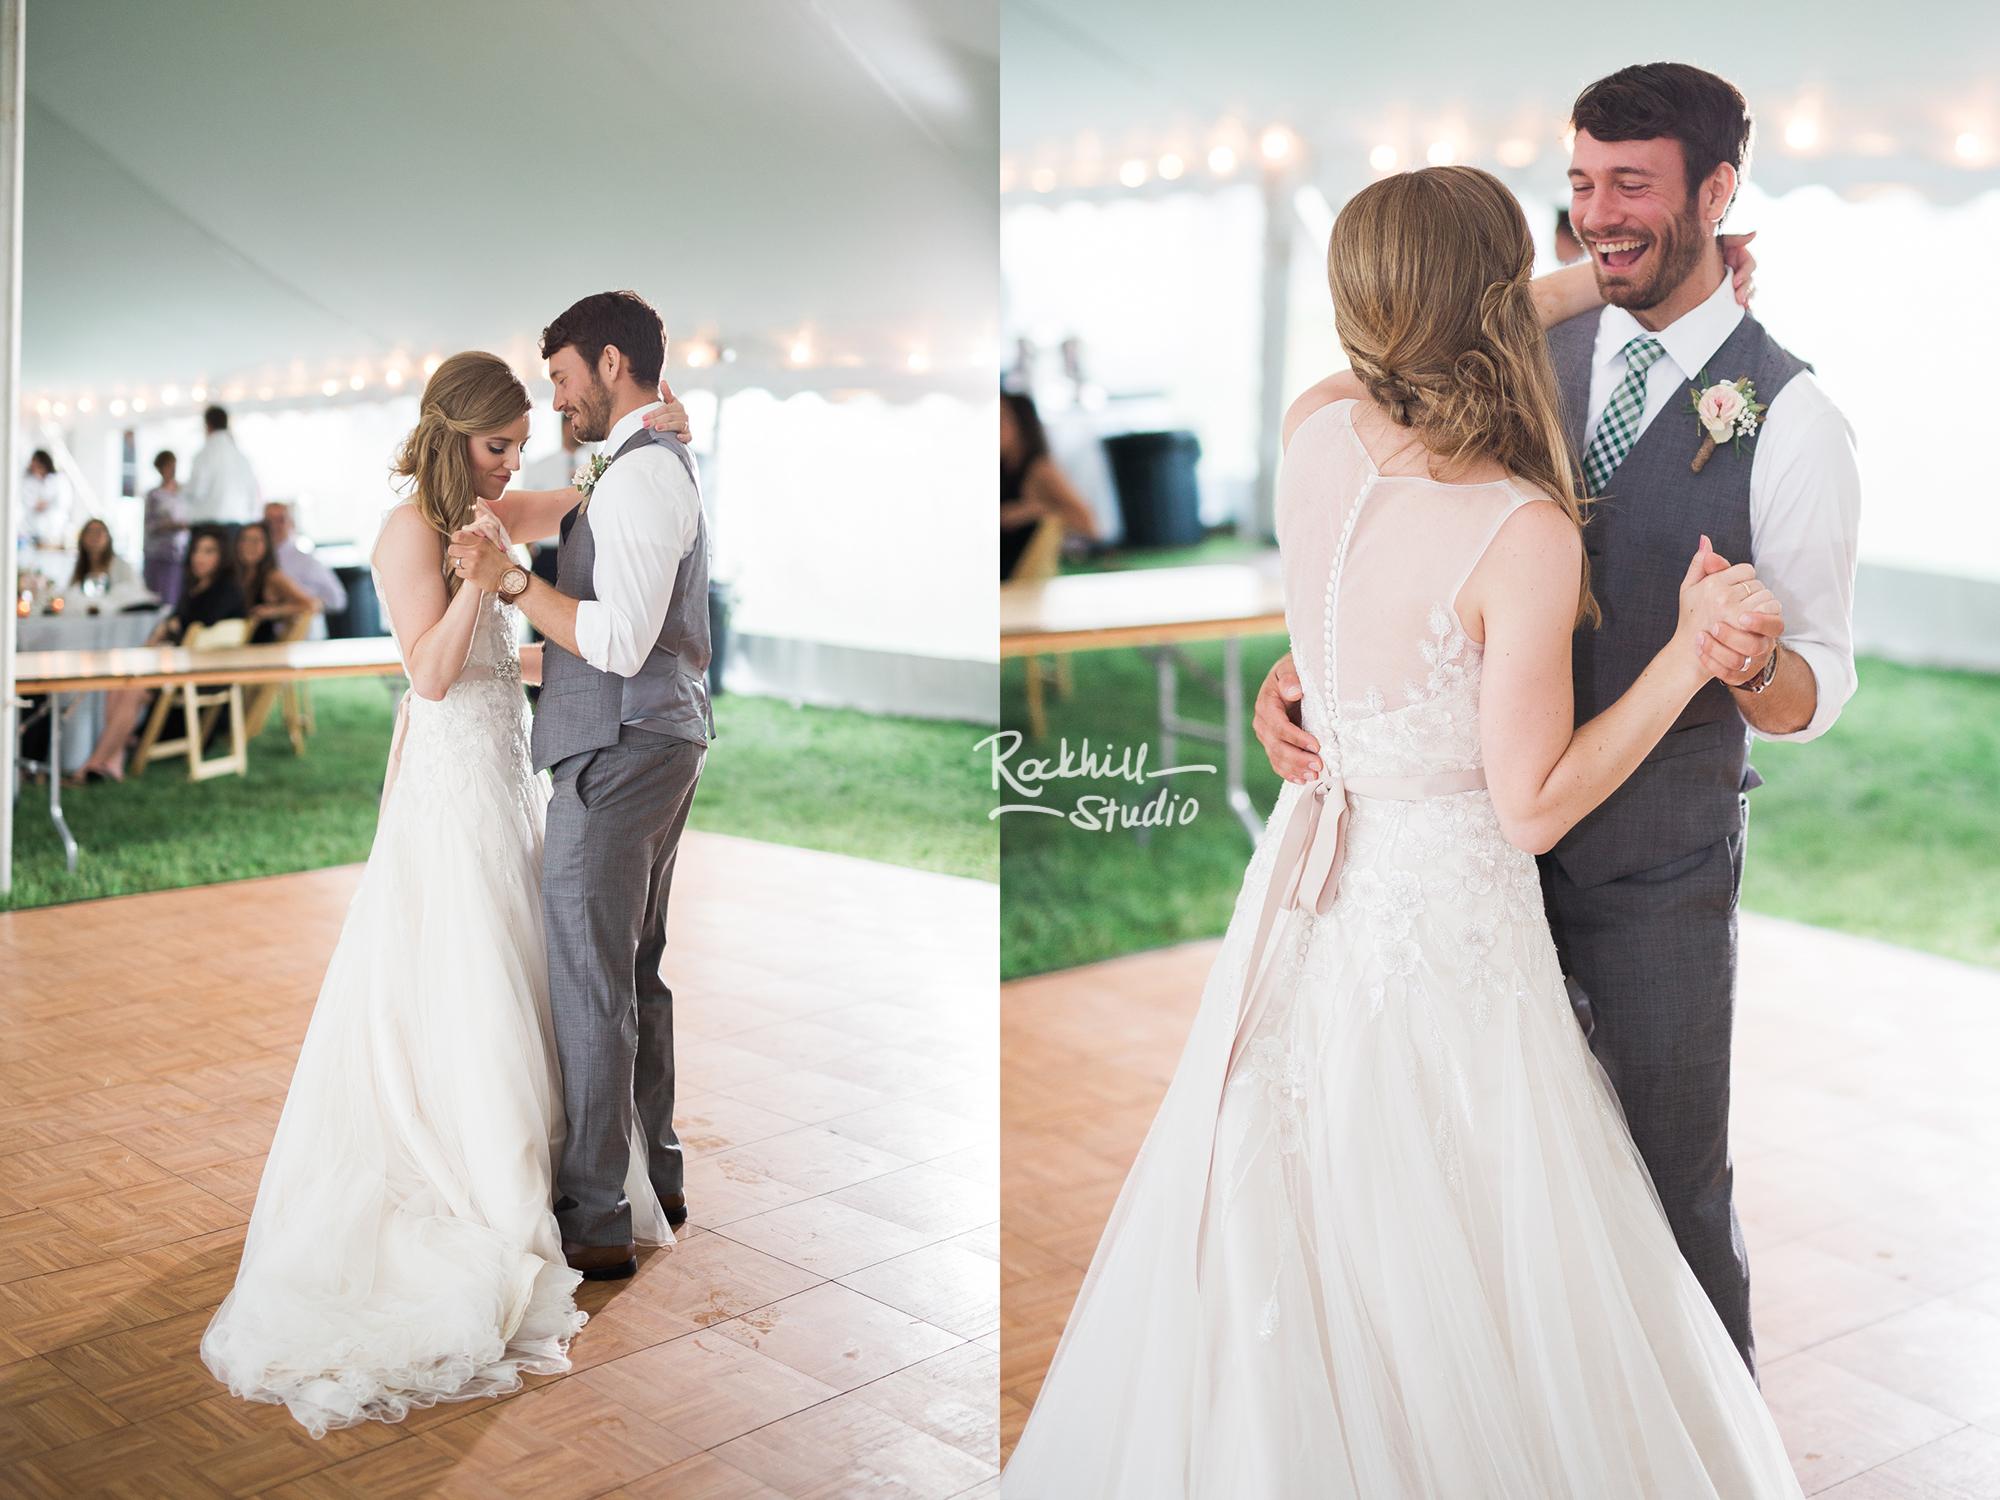 marquette-michigan-wedding-upper-peninsula-spring-photography-rockhill-ee-65.jpg